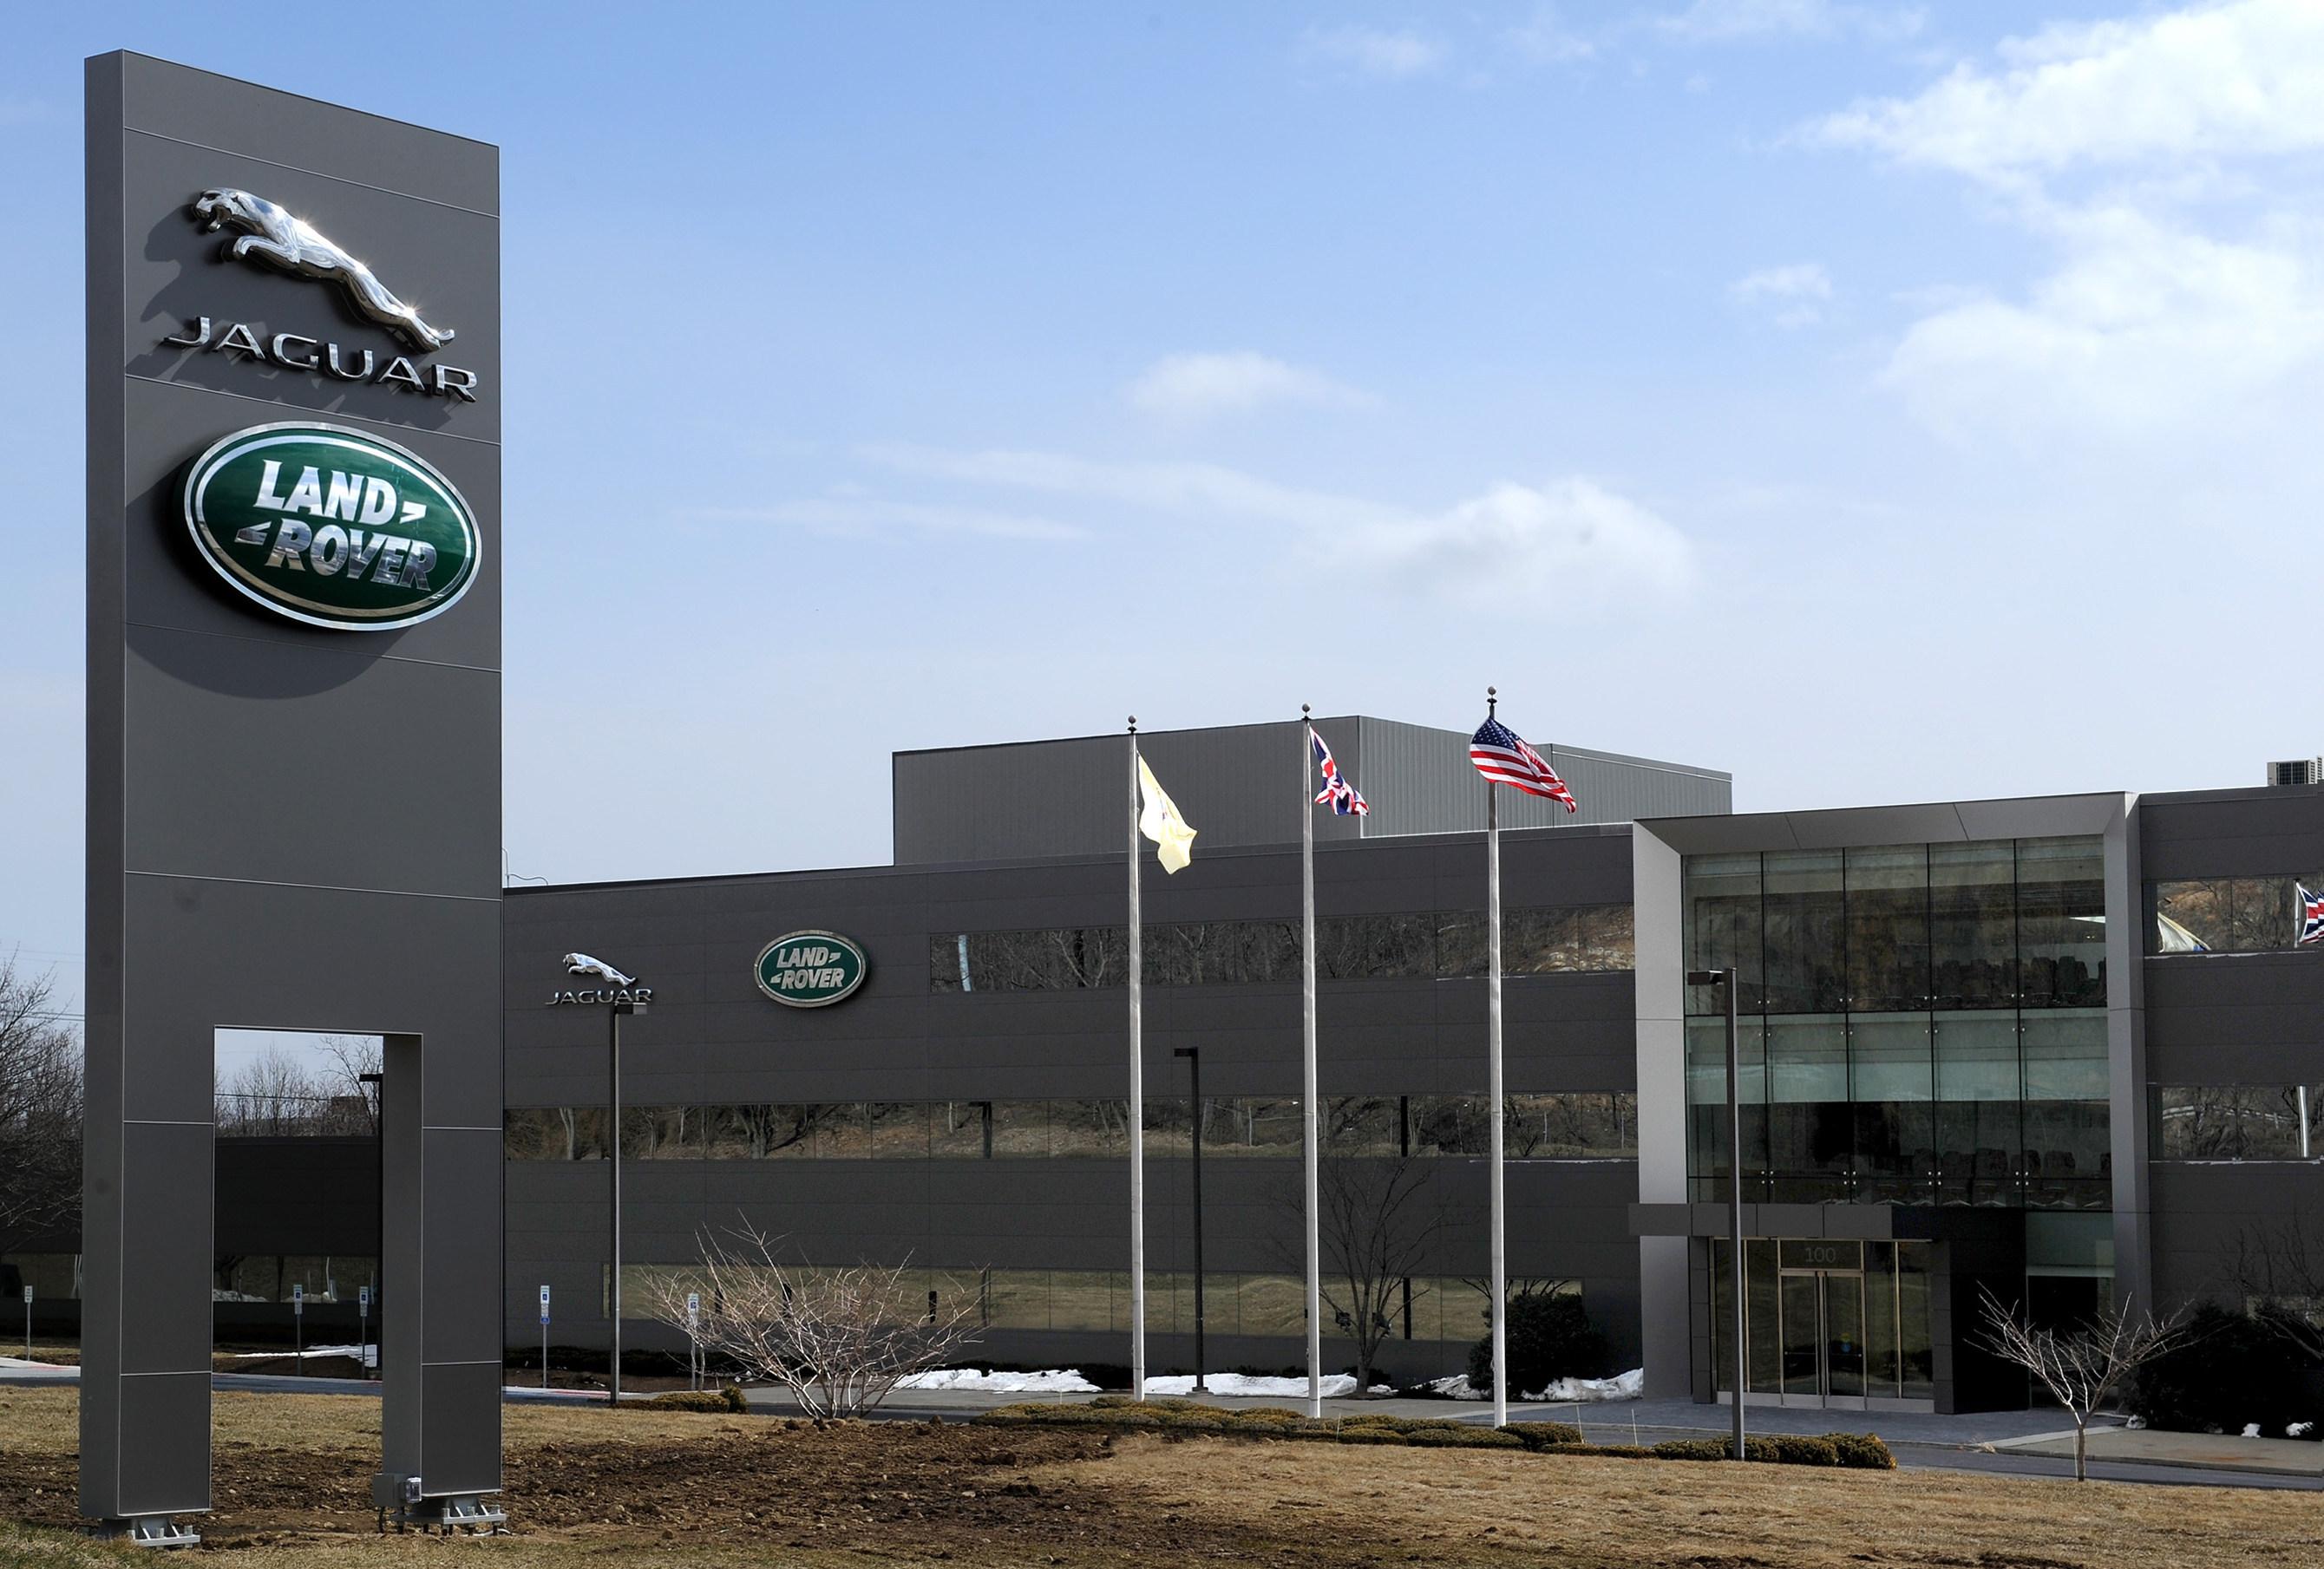 Global Auto Leasing >> Jaguar Opens New Headquarters - Operations - Automotive Fleet